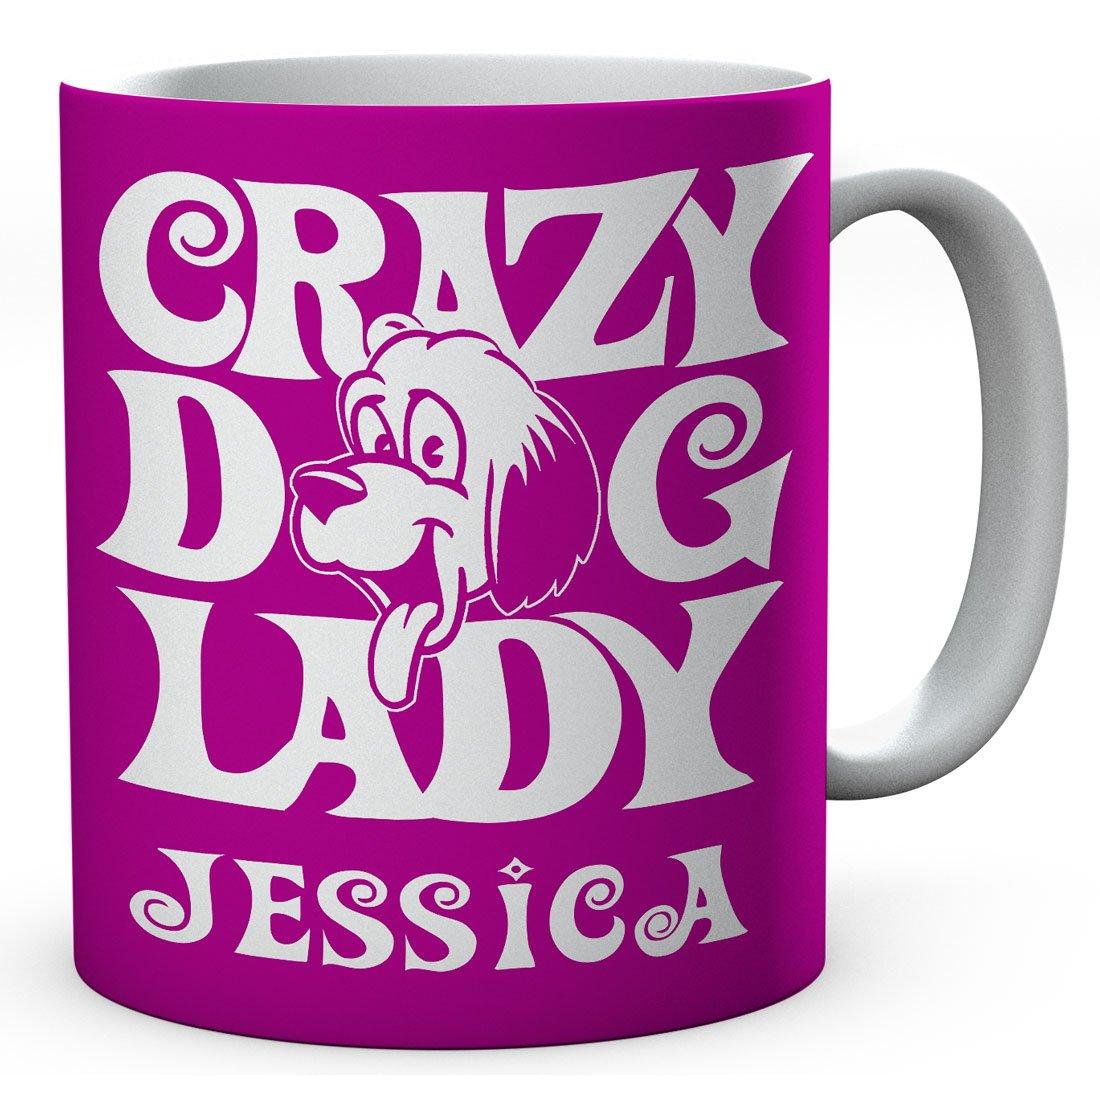 Personalised Crazy Dog Lady Ceramic Printed Mug